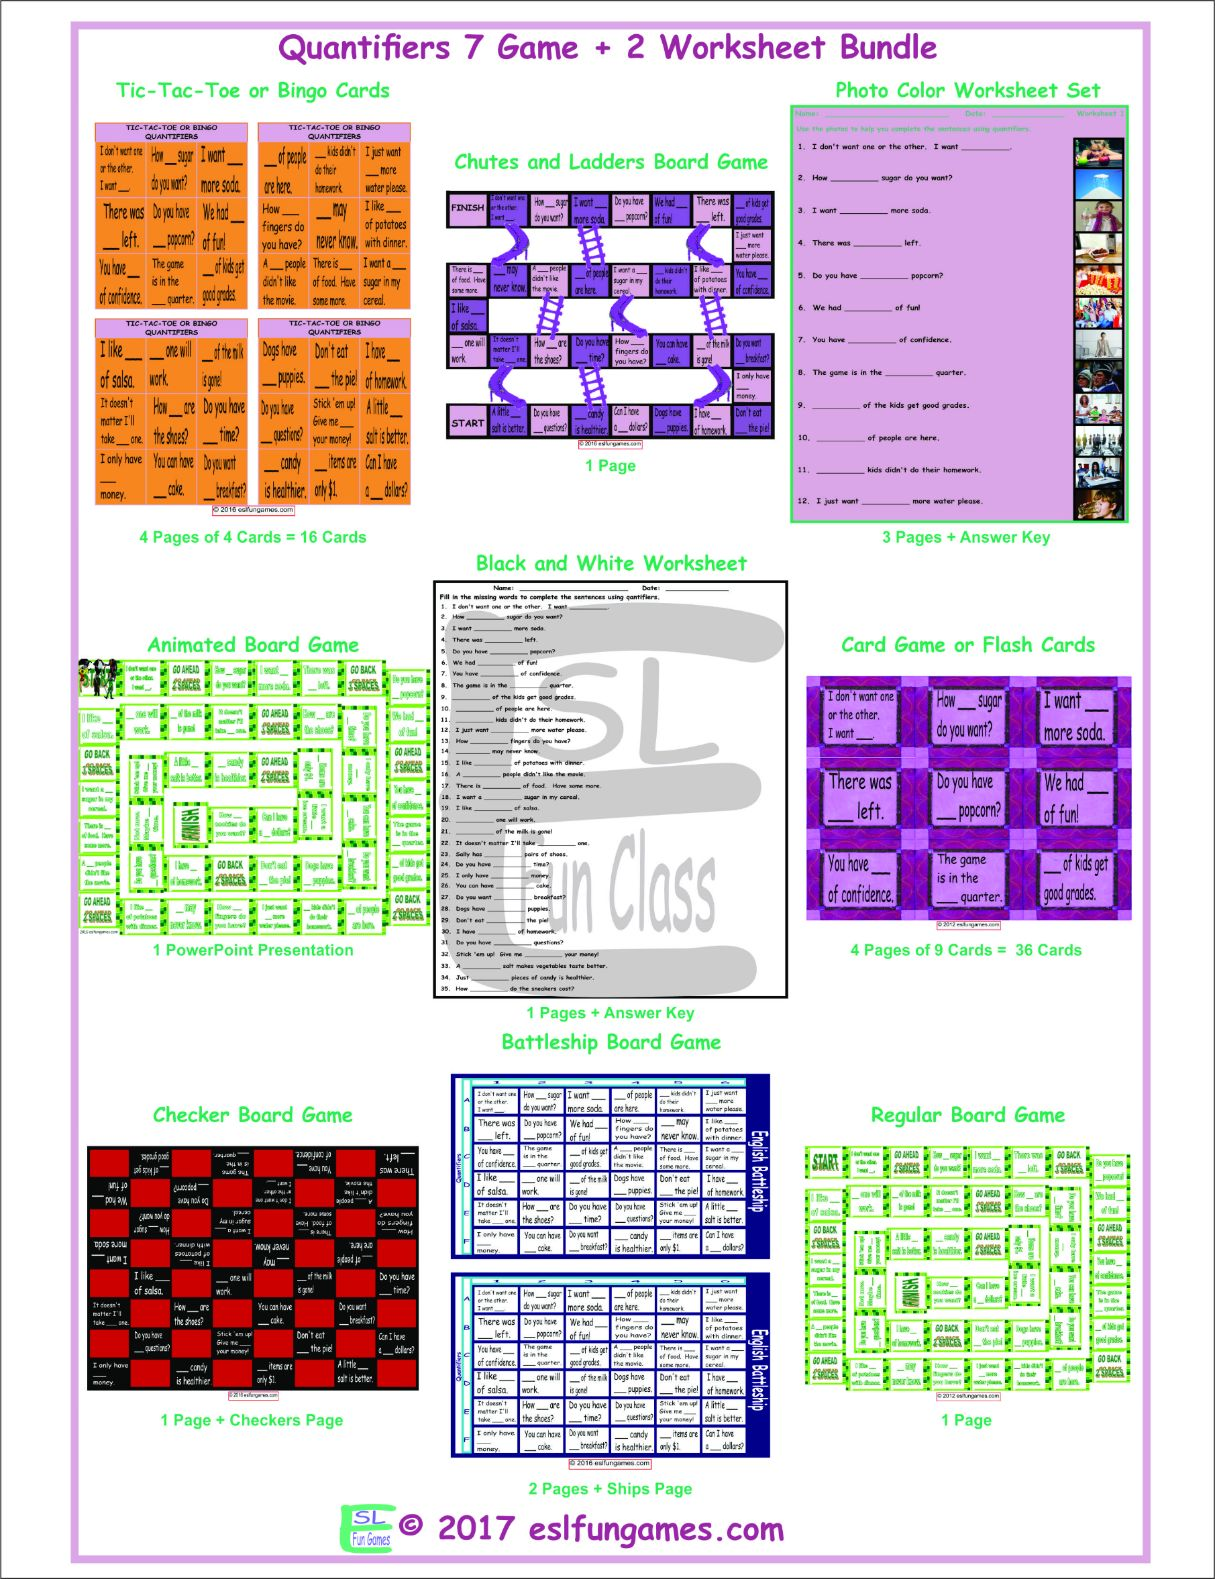 Quantifiers 7 Game Plus 2 Worksheet Bundle